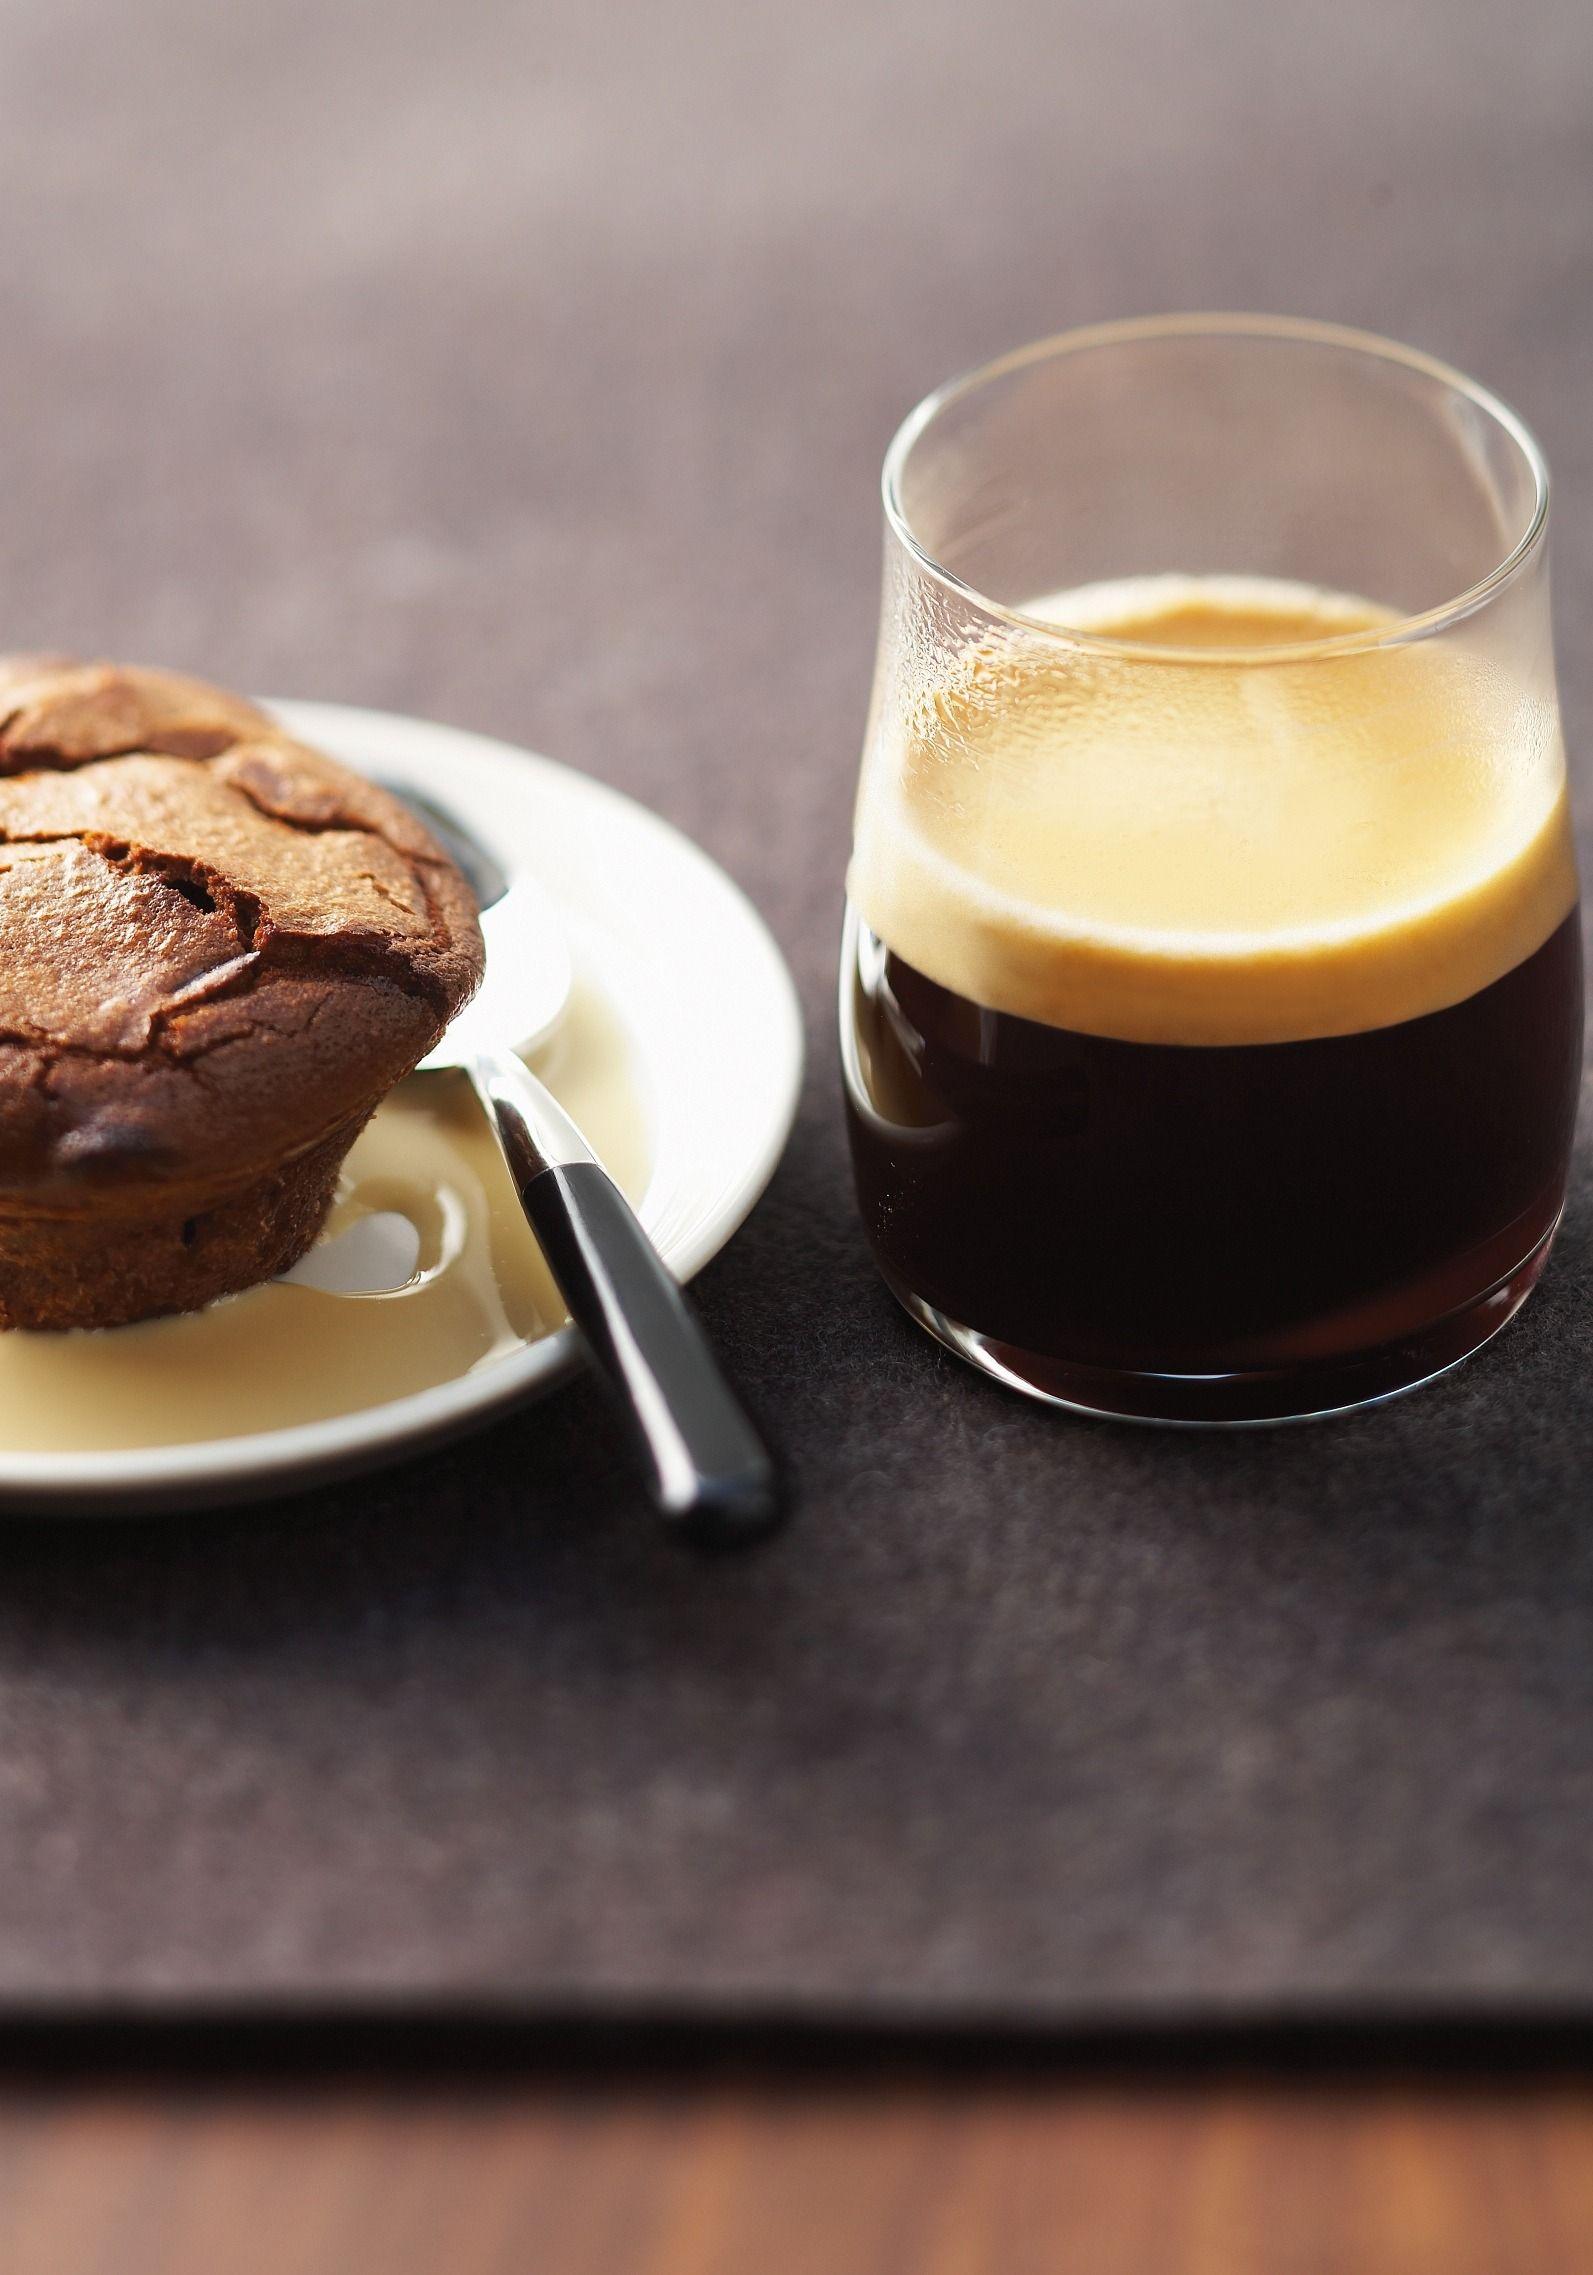 vivalto lungo chocolate fondants with coffee custard. Black Bedroom Furniture Sets. Home Design Ideas